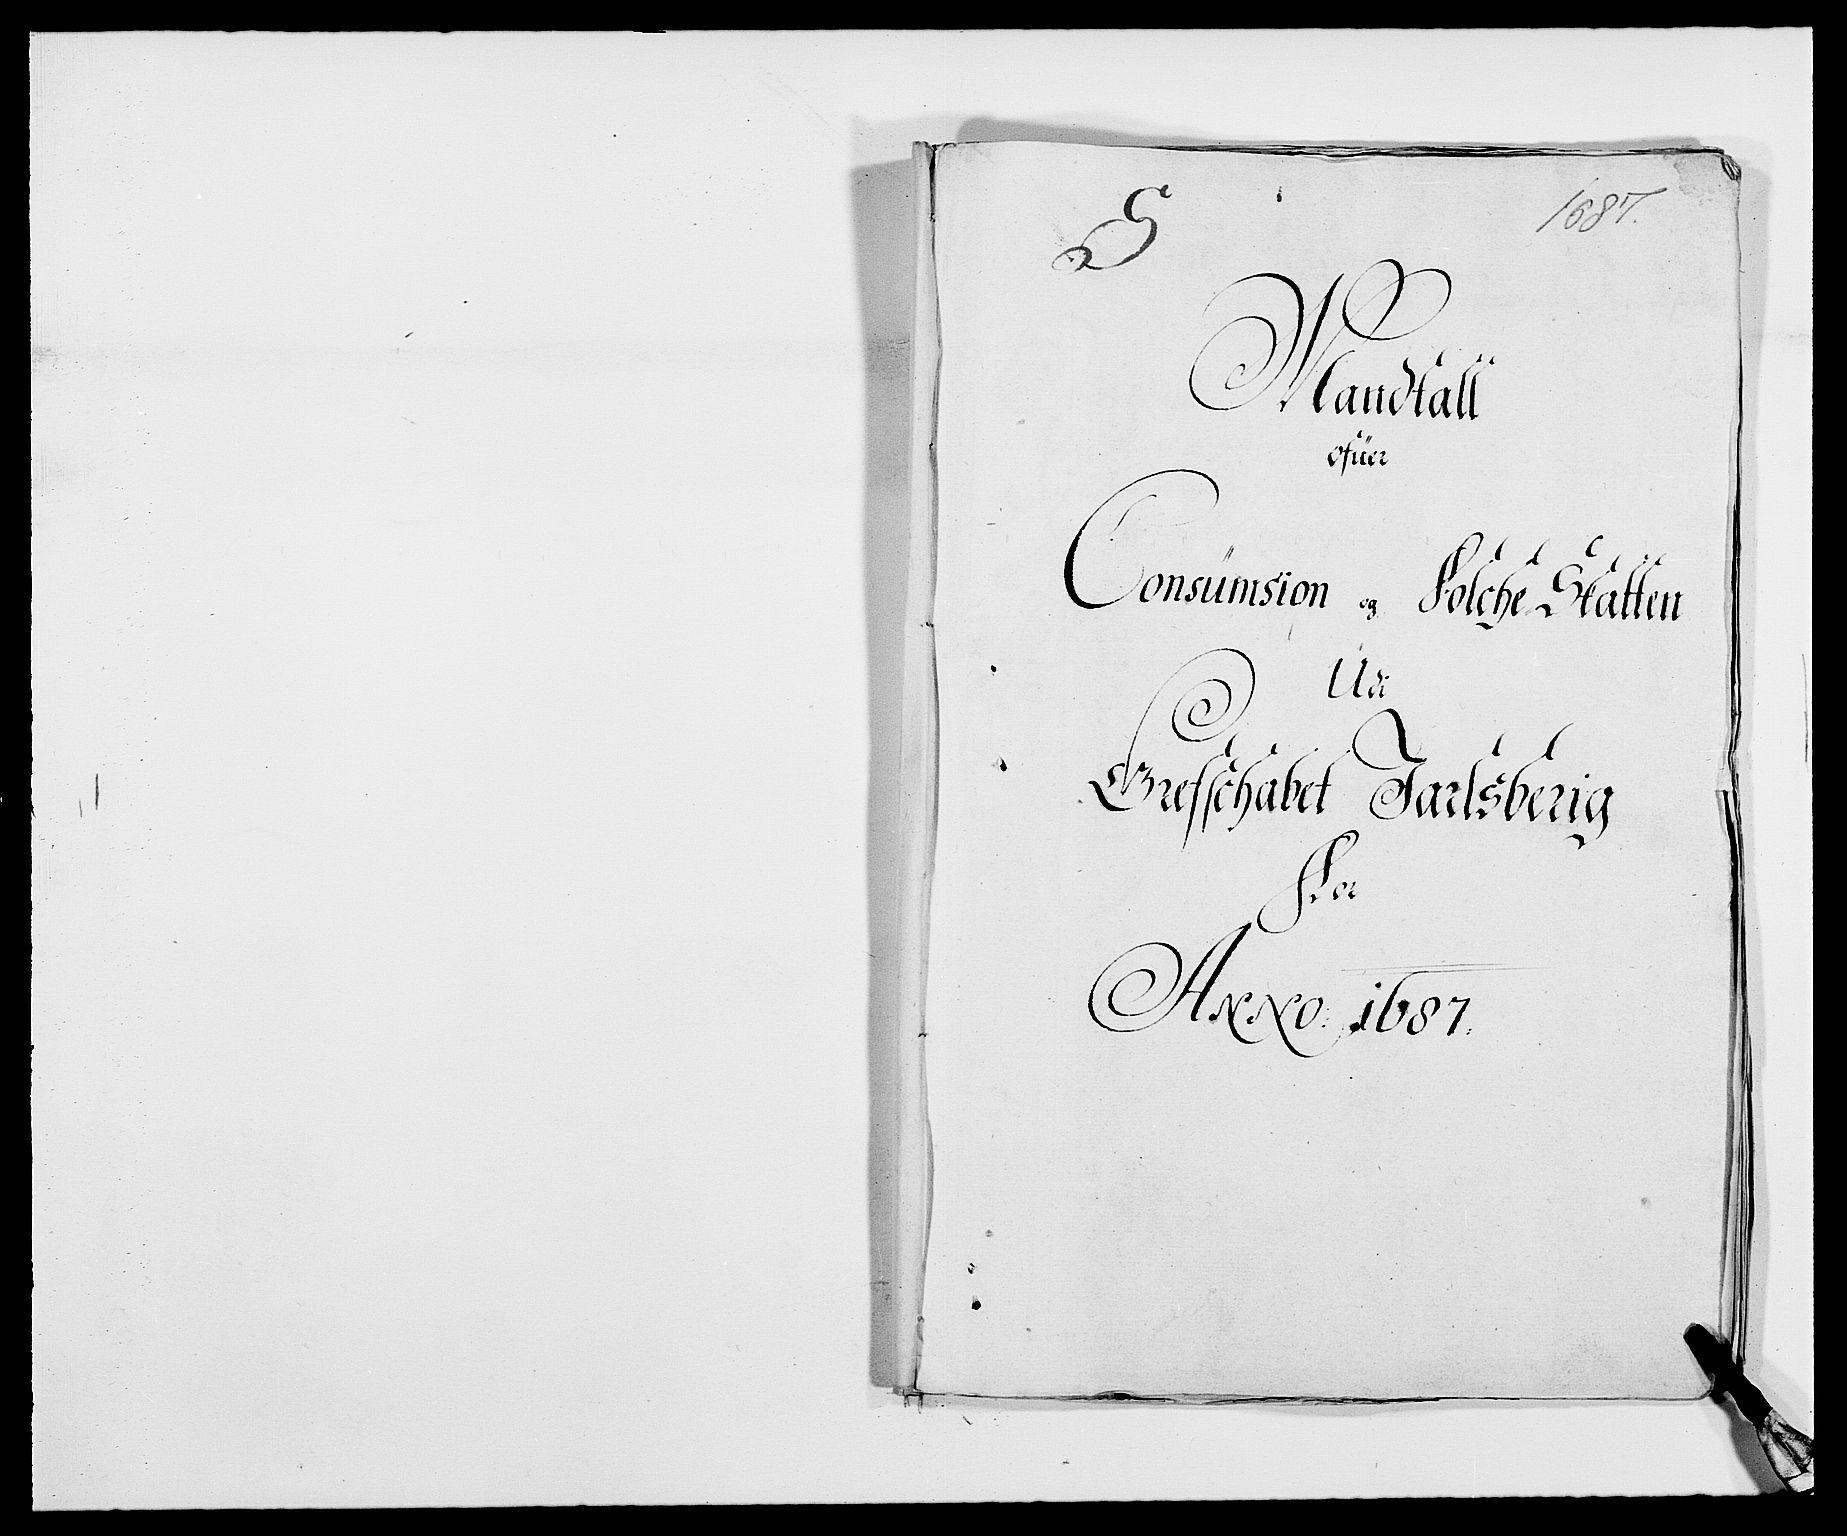 RA, Rentekammeret inntil 1814, Reviderte regnskaper, Fogderegnskap, R32/L1858: Fogderegnskap Jarlsberg grevskap, 1686-1690, s. 309